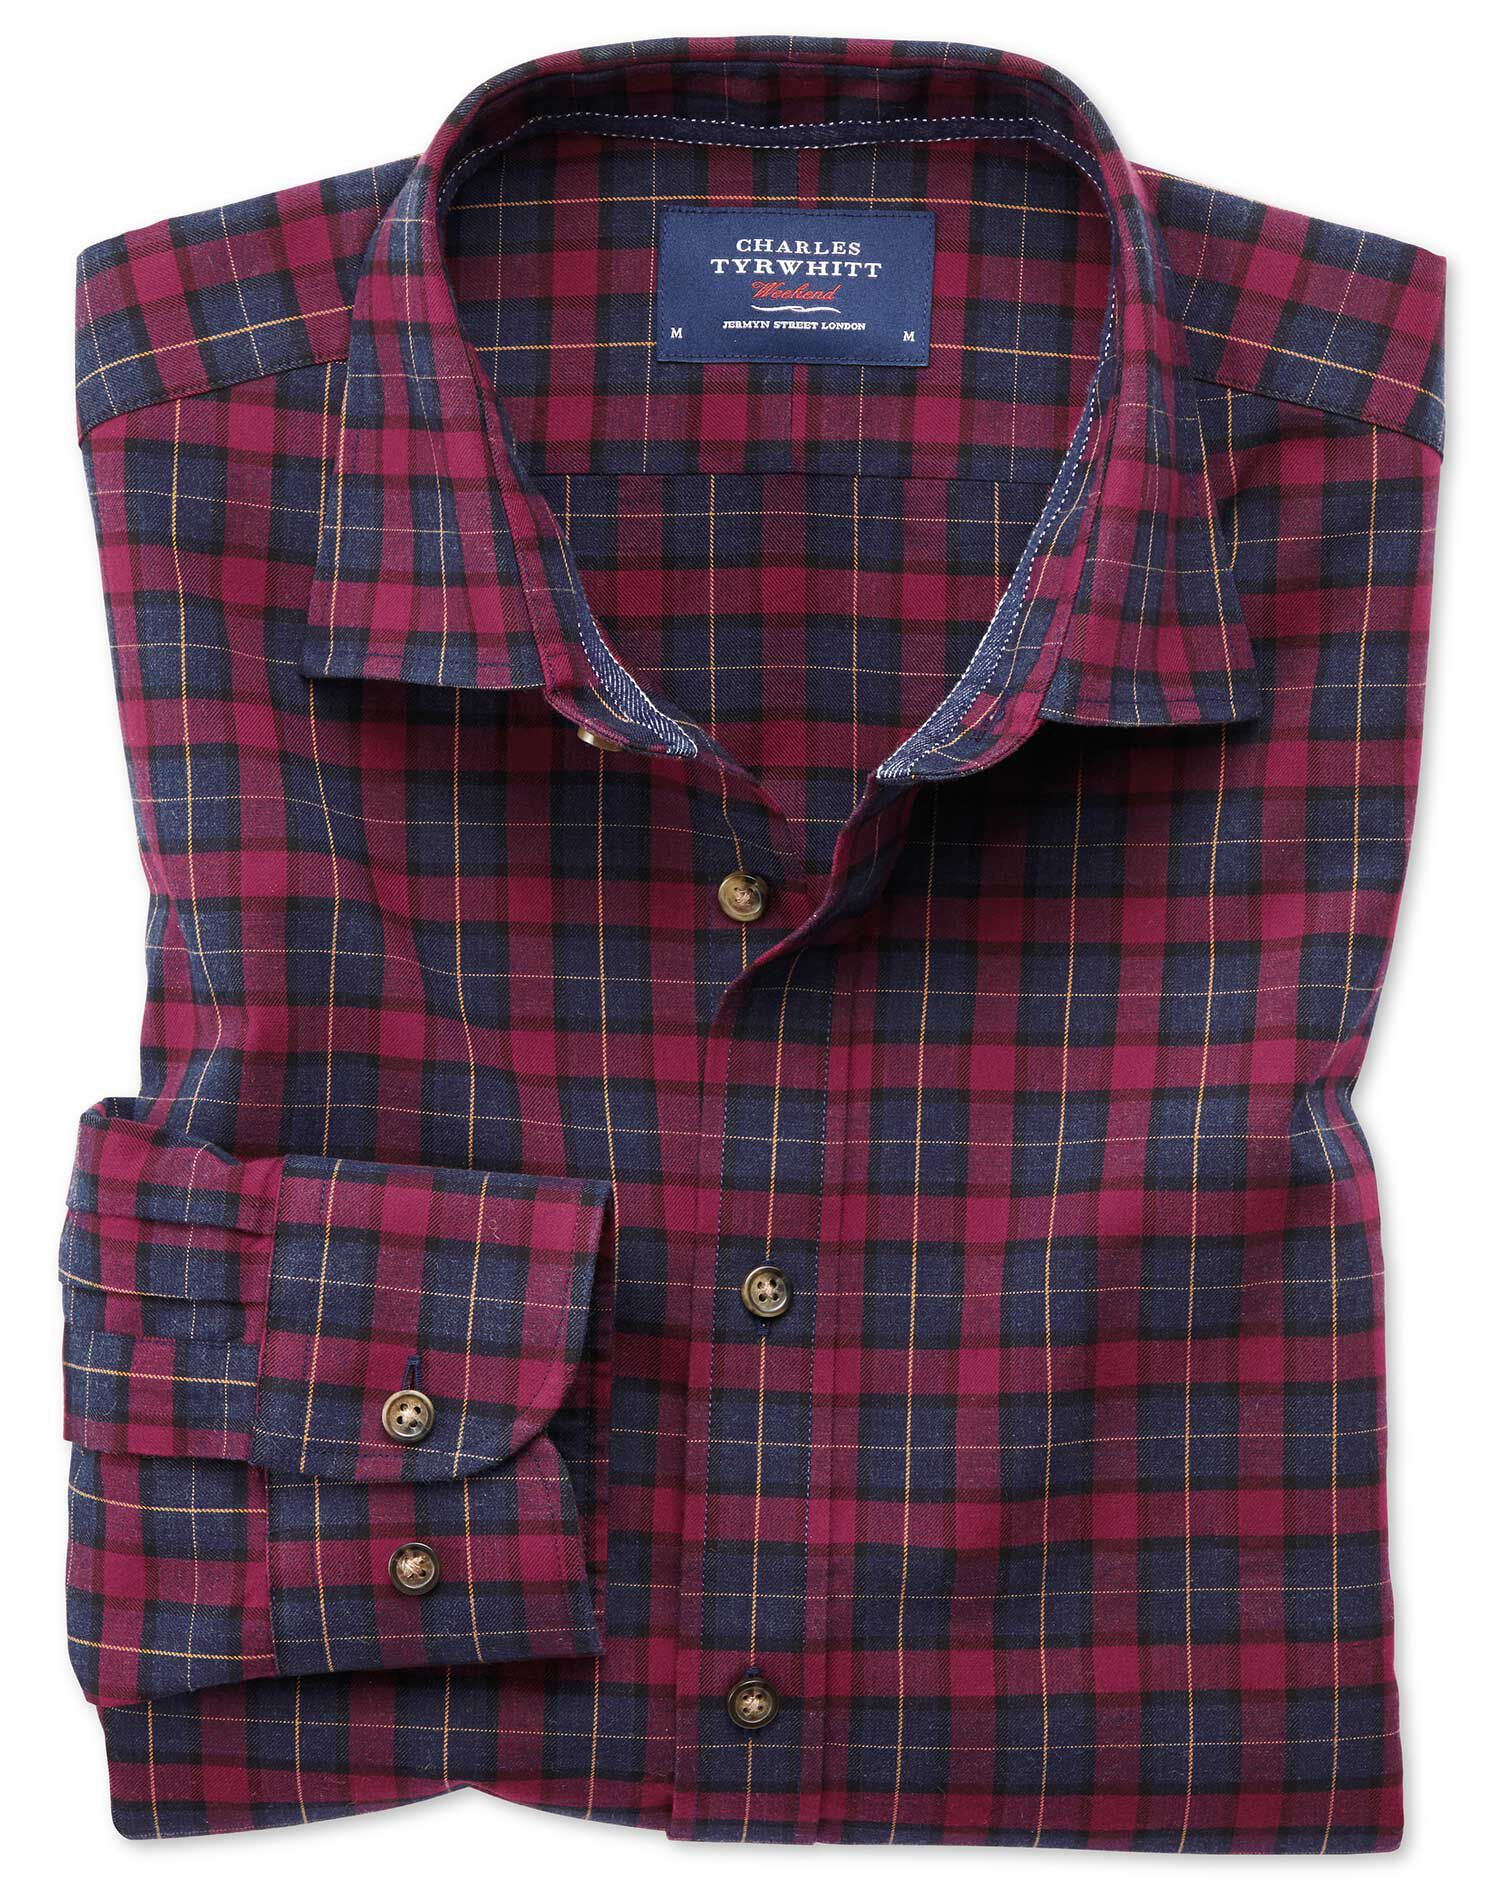 Classic Fit Heather Tartan Burgundy and Navy Blue Check Cotton Shirt Single Cuff Size Medium by Char